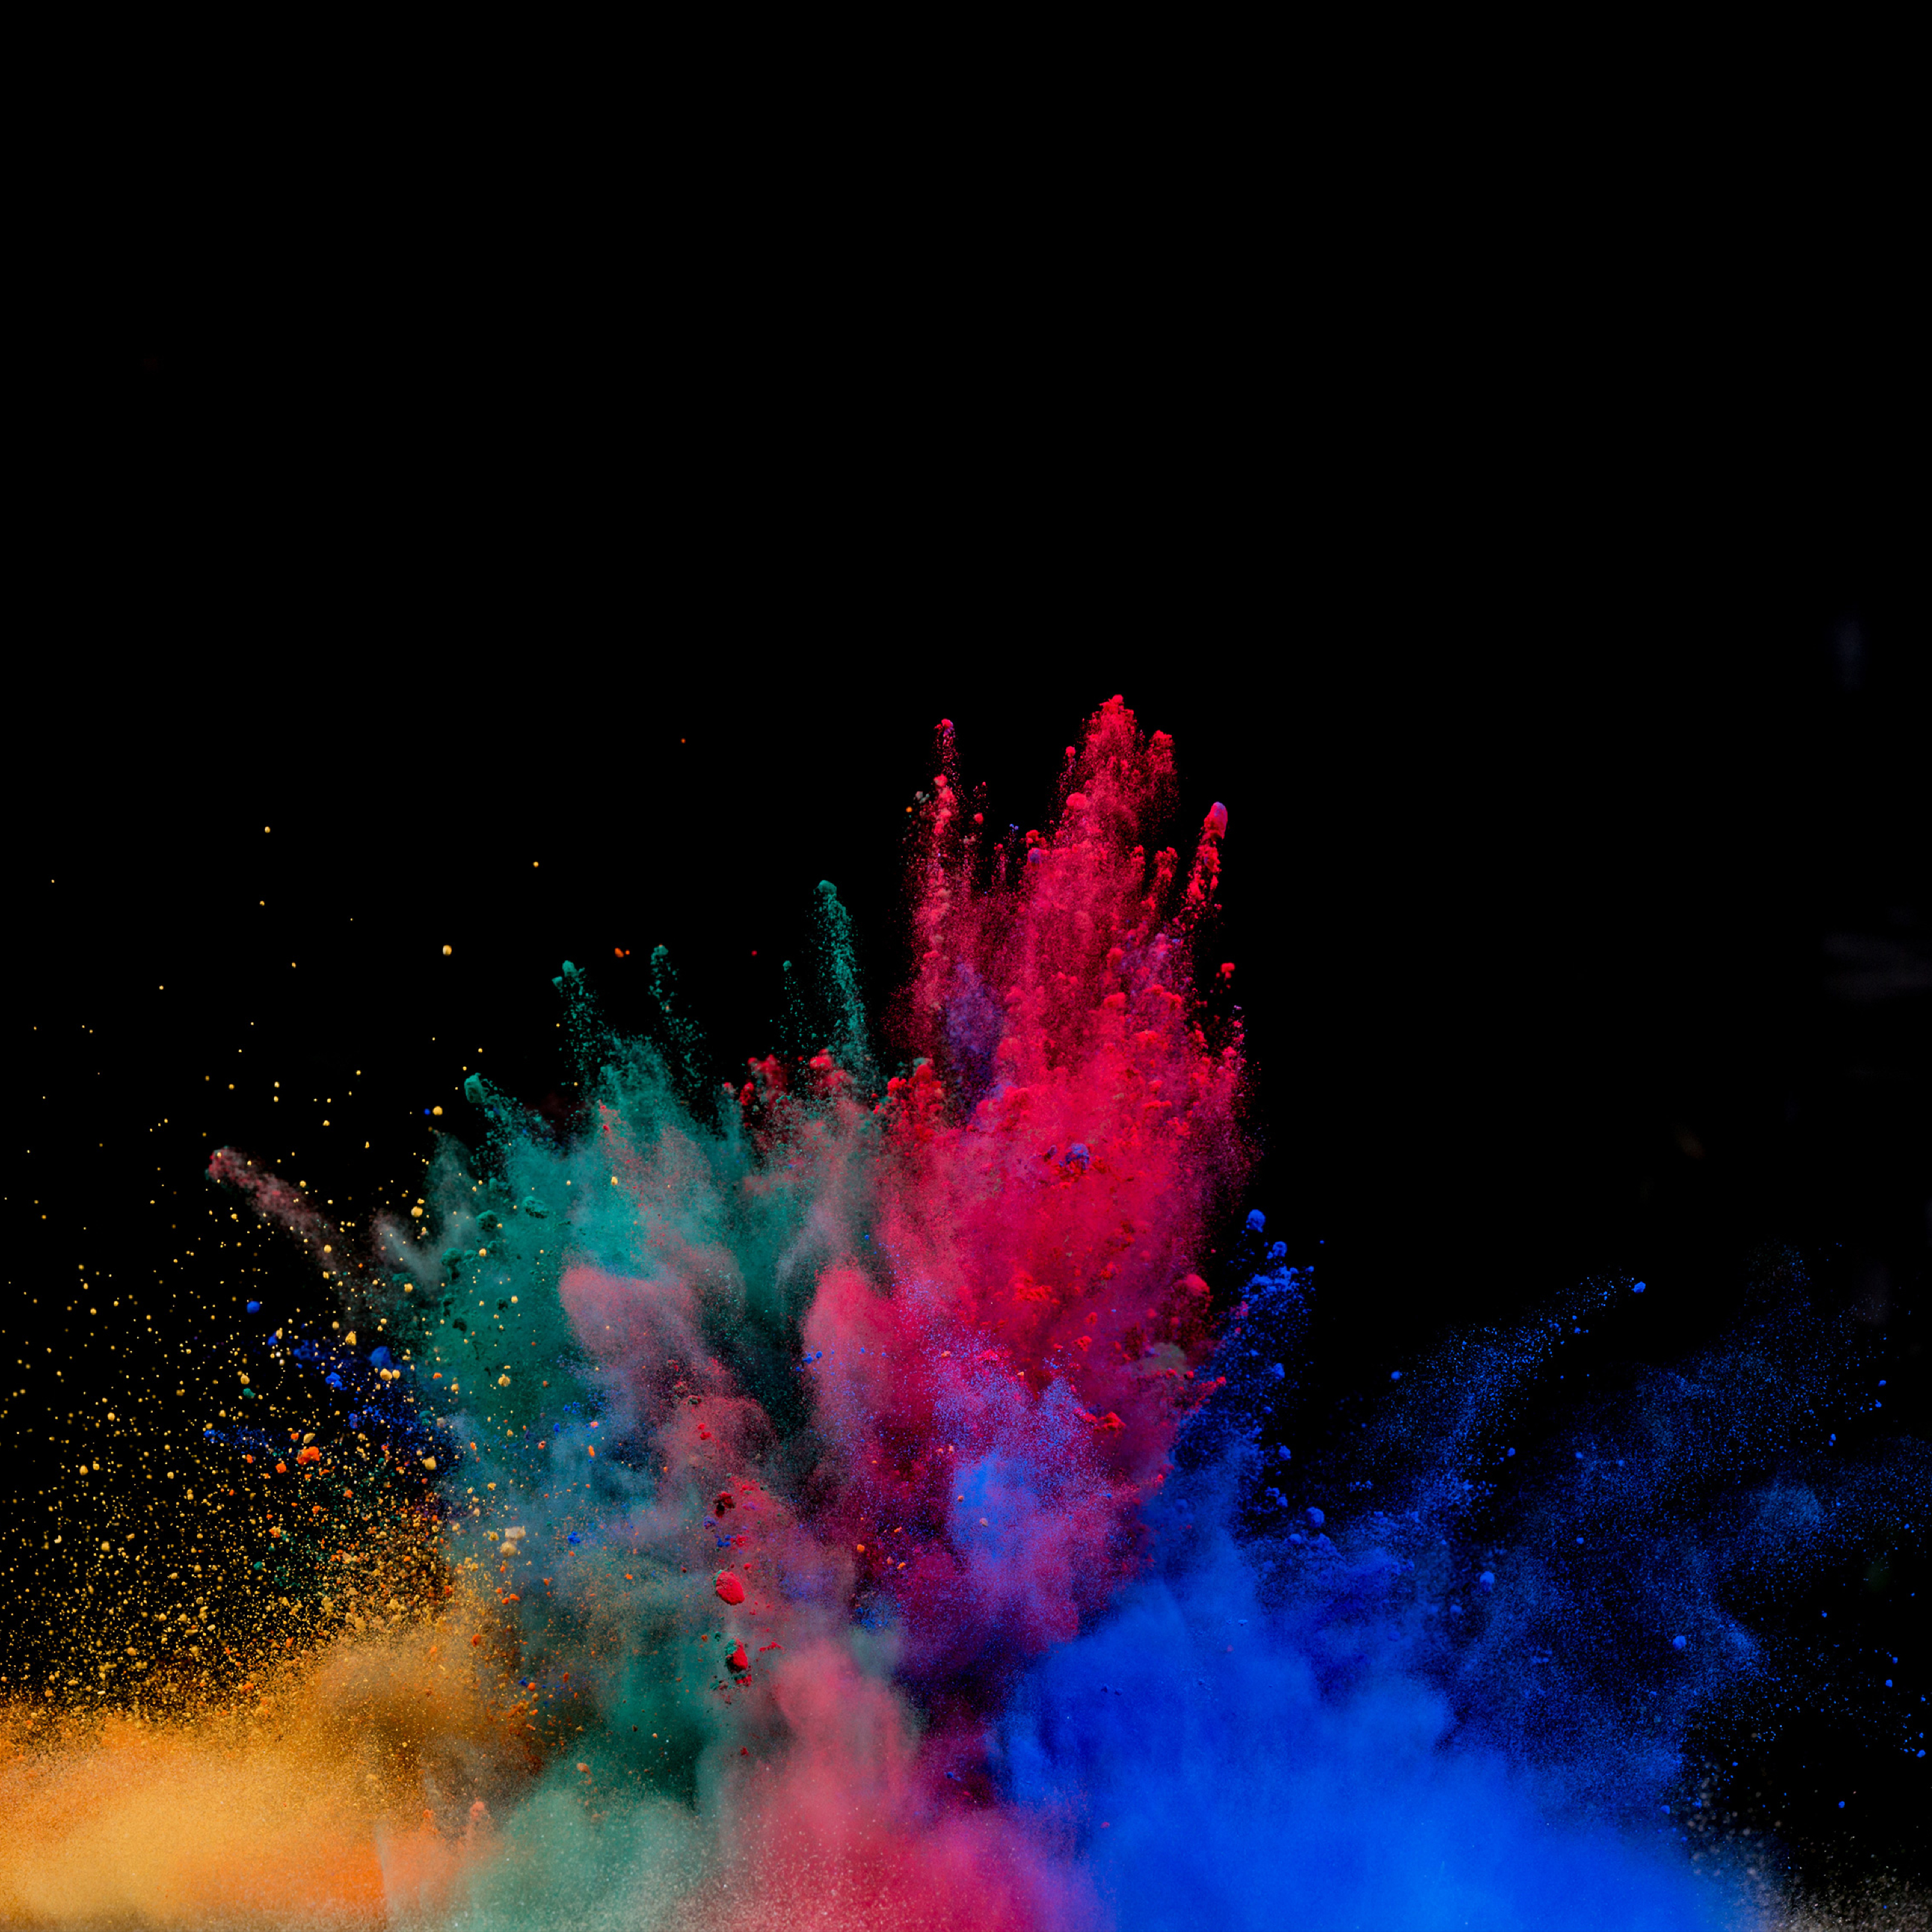 Colorful Powder Explosion, HD 4K Wallpaper